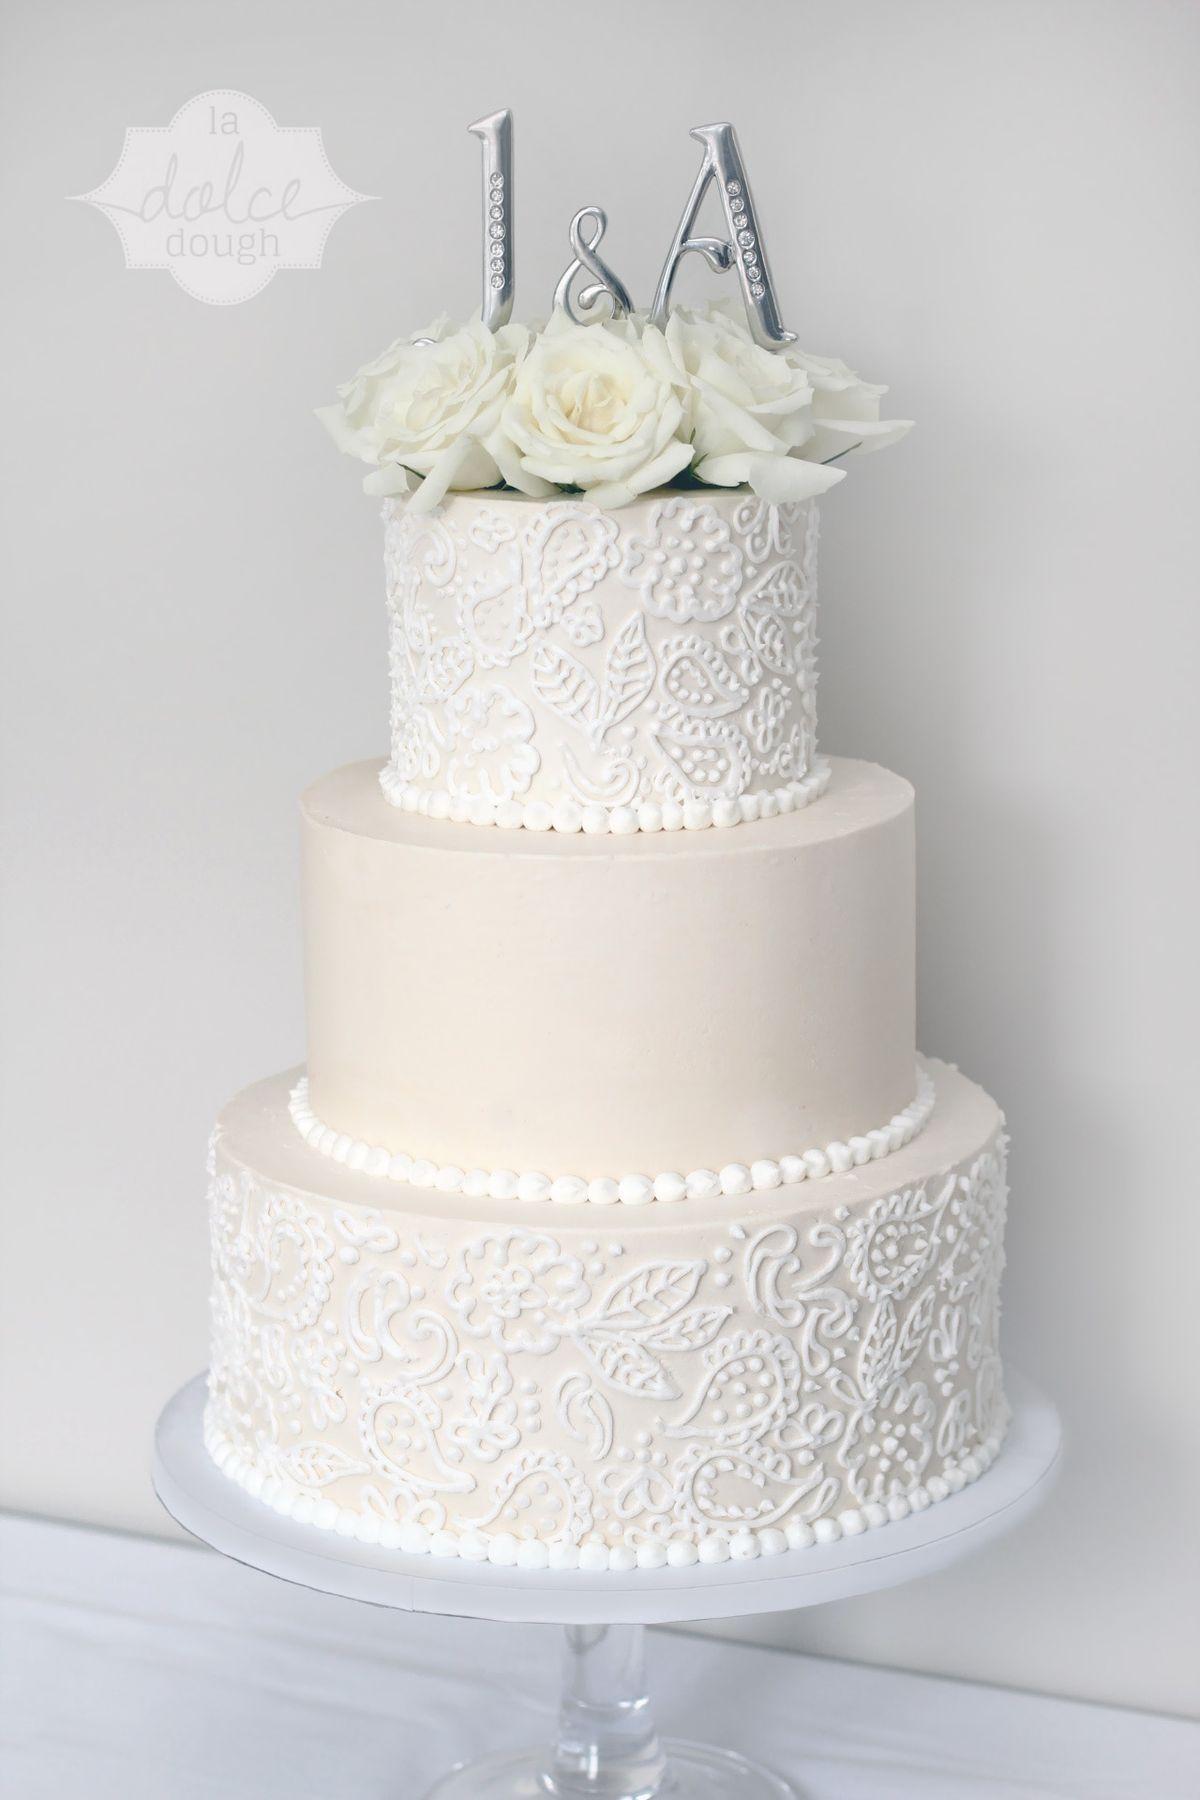 14 amazing buttercream wedding cakes photos | Pinterest ...